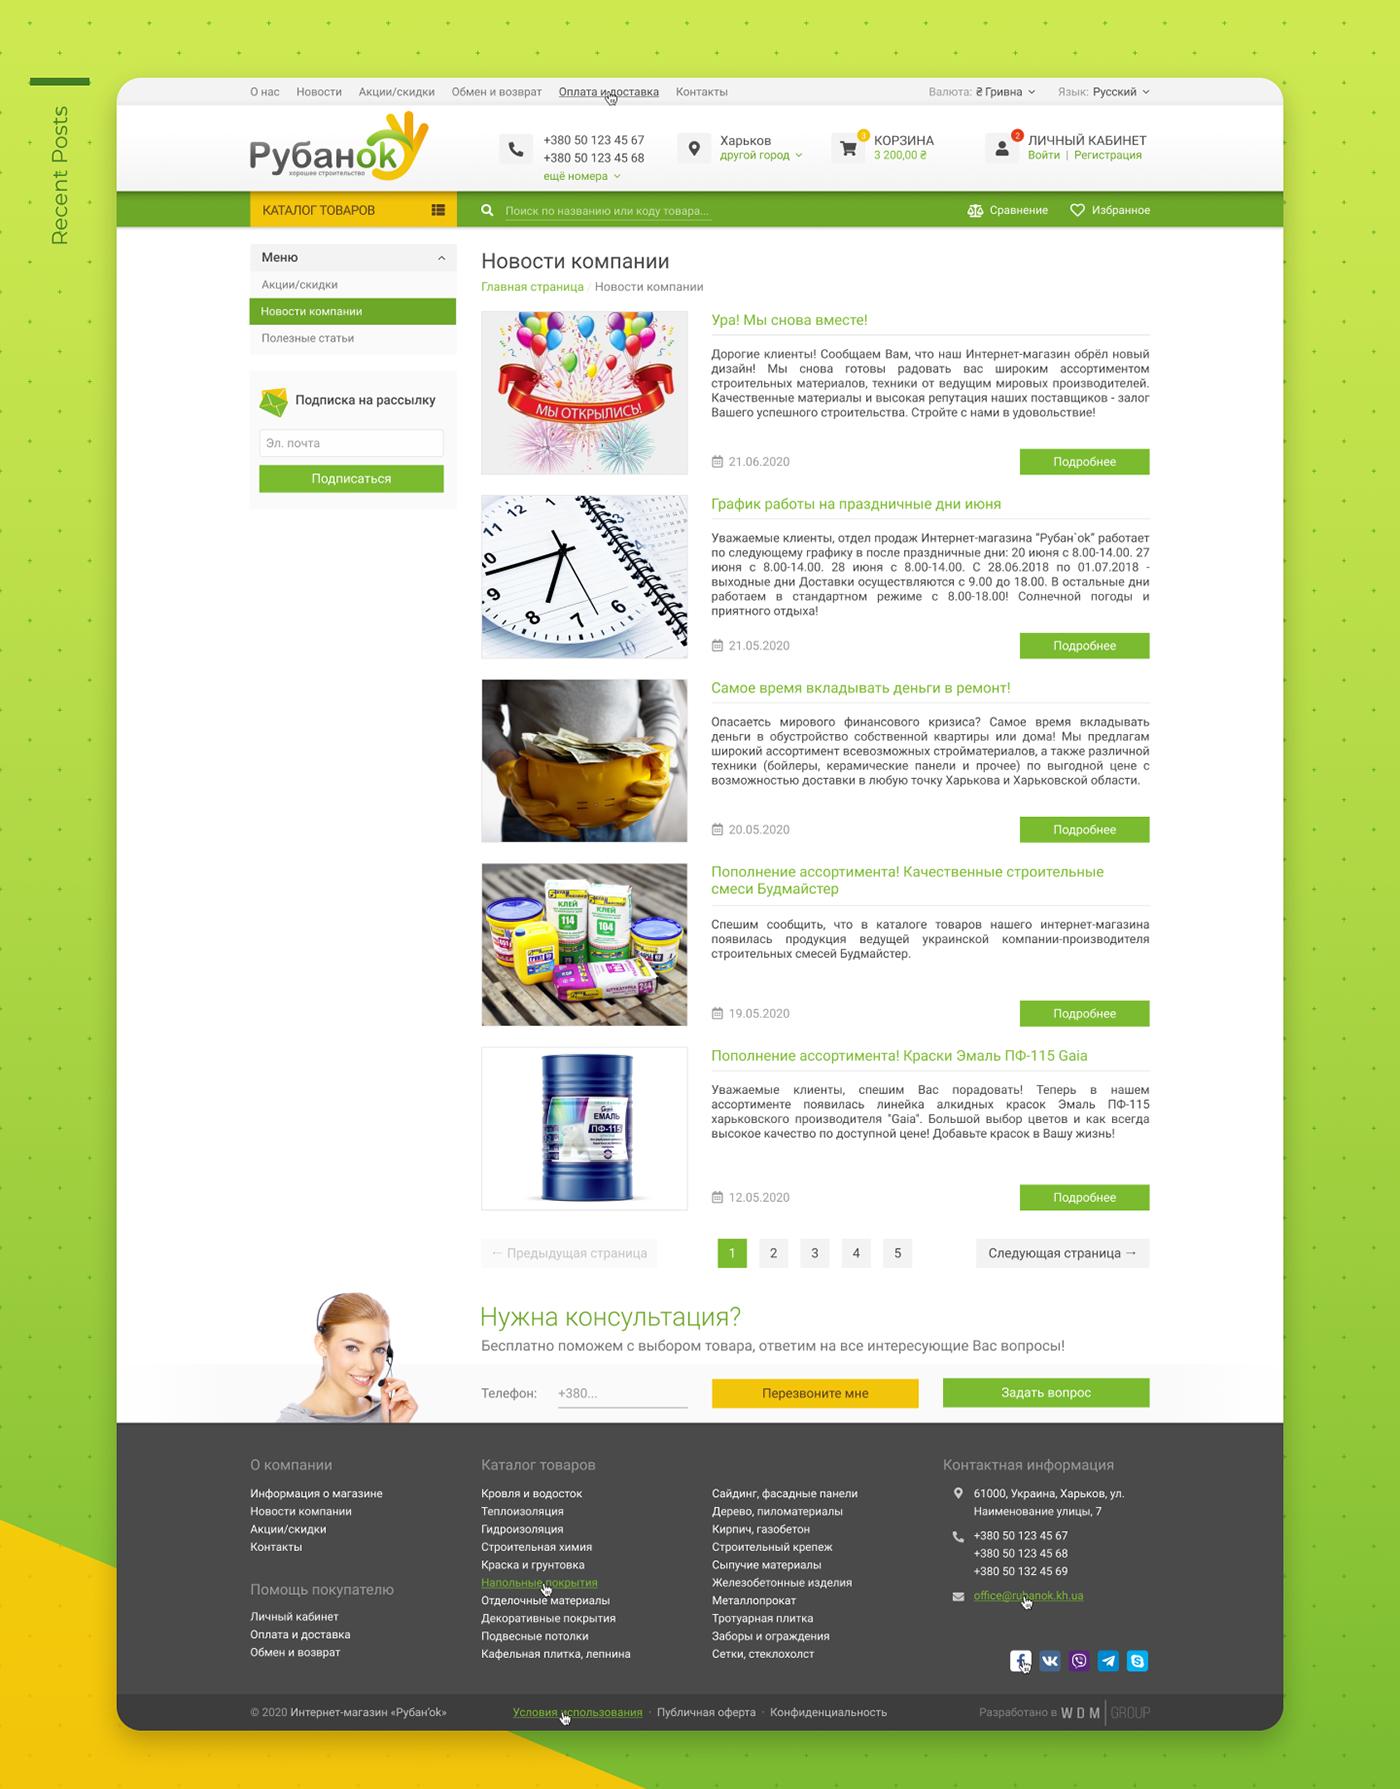 commerce construction Construction materials online store Ruban'ok Рубан'ok